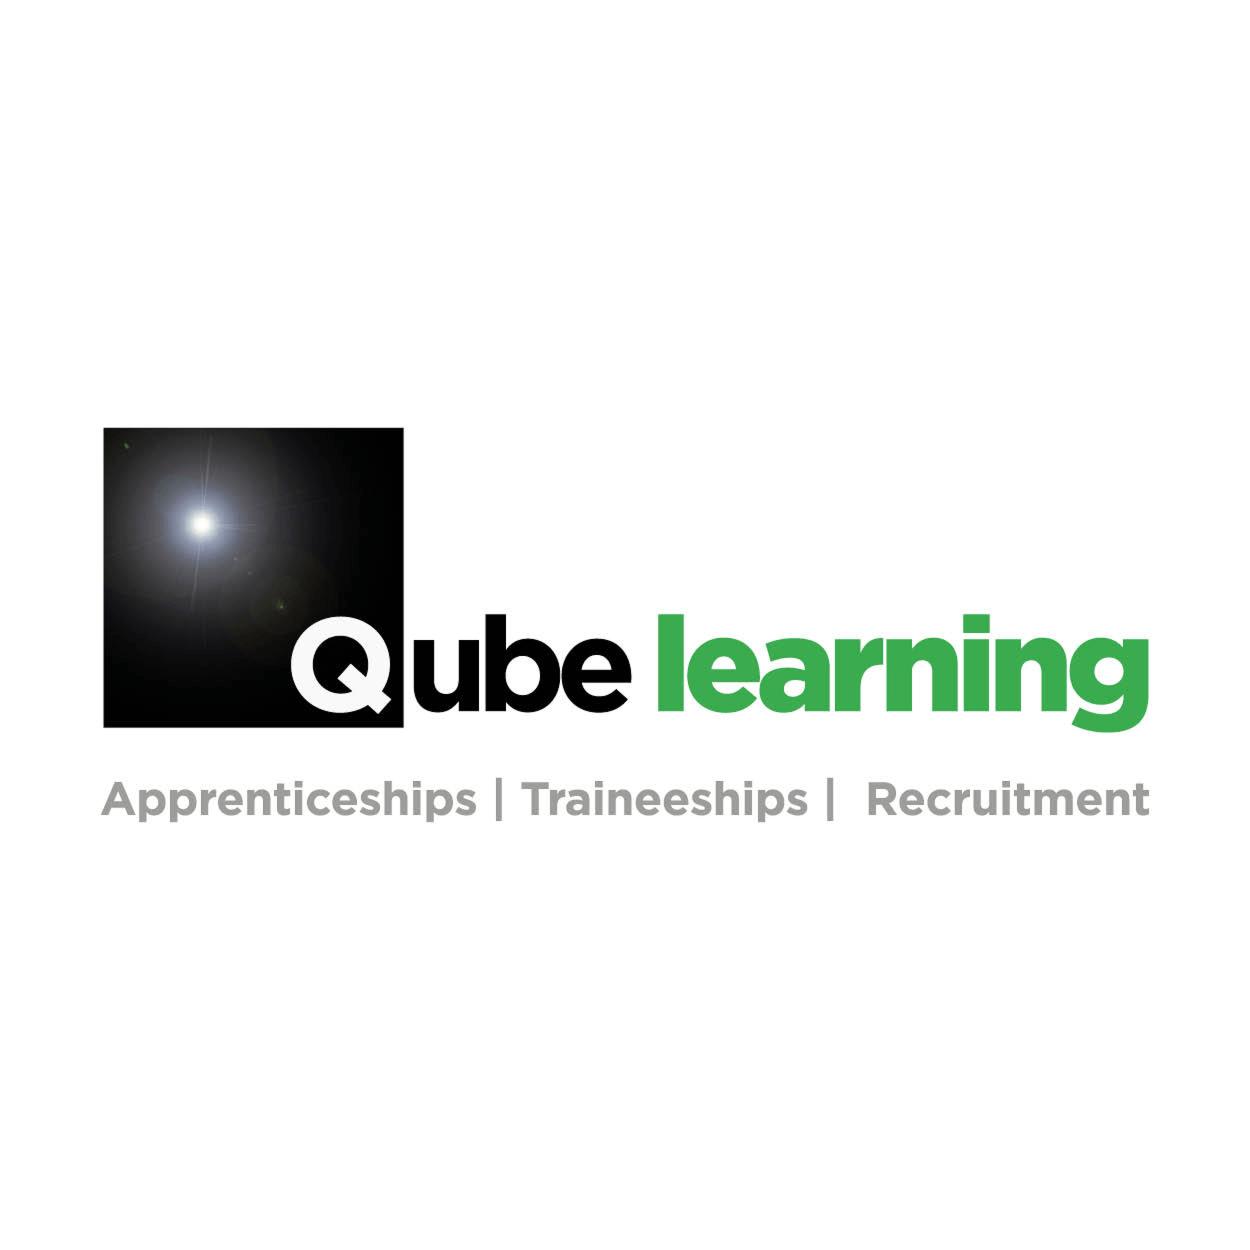 Qube Learning